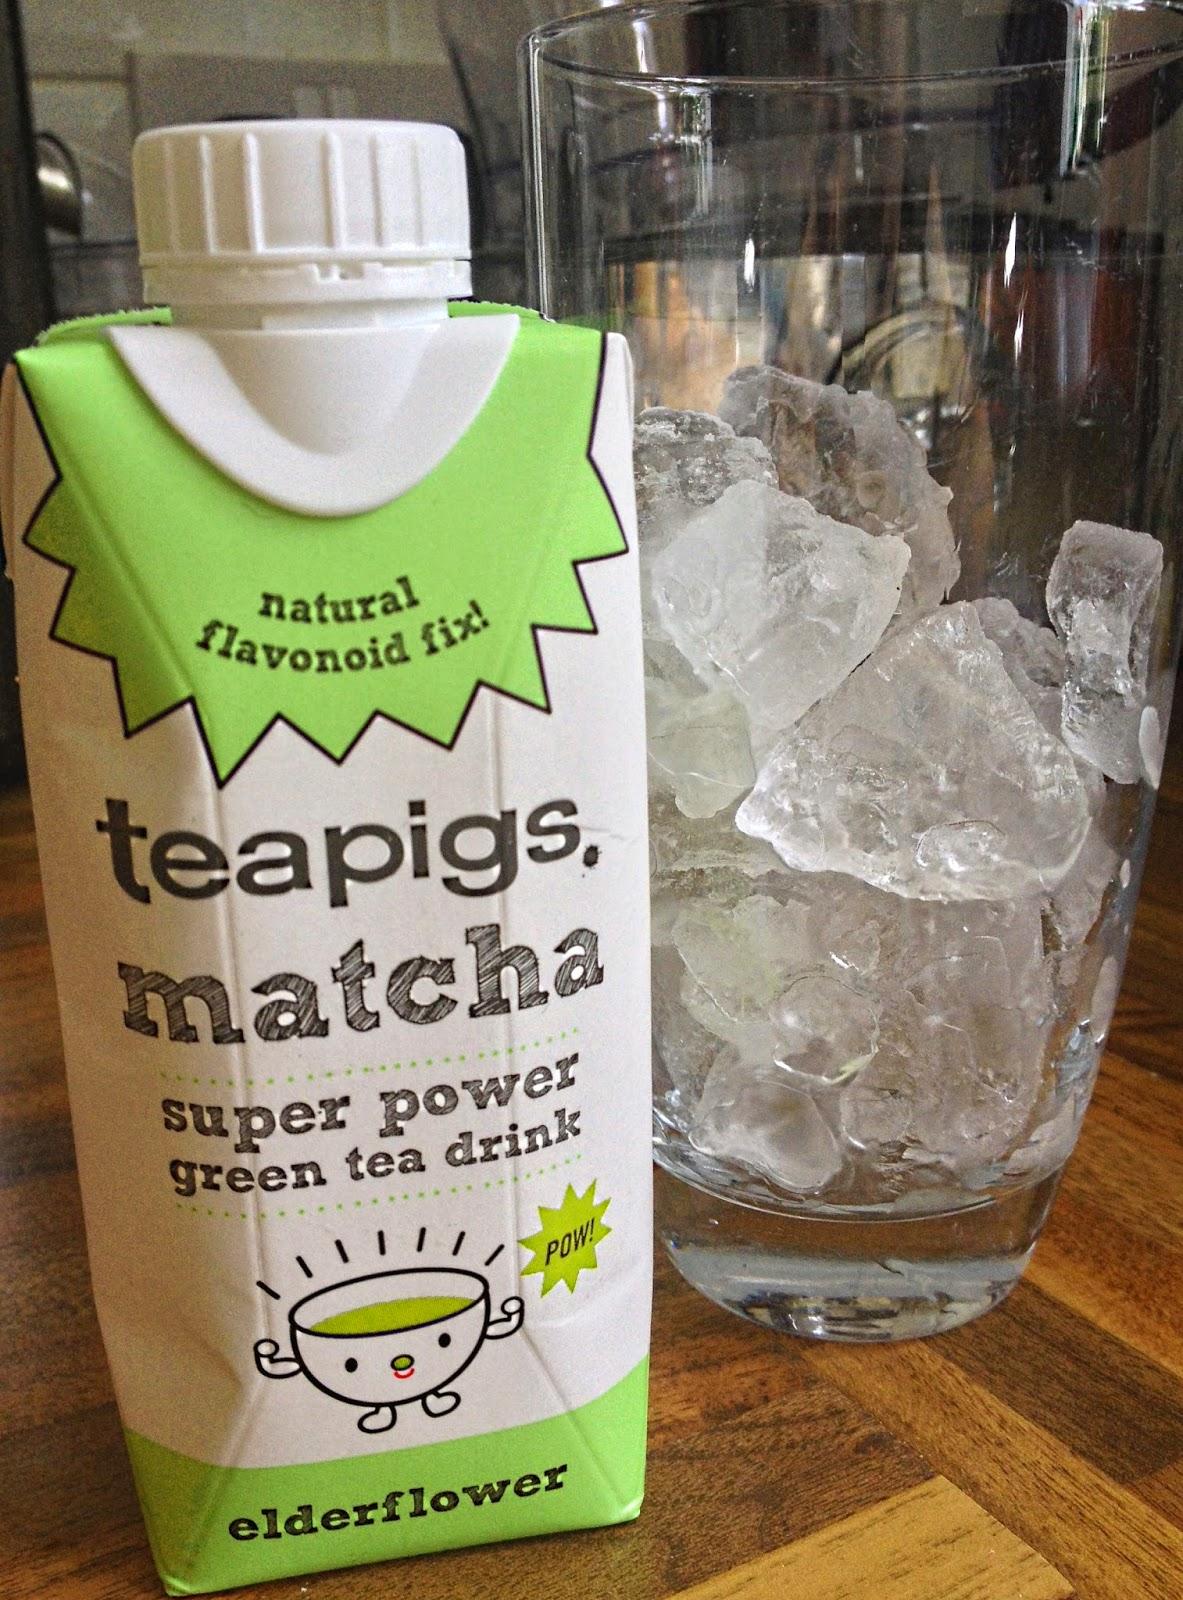 ThatRedheadSaid : teapigs matcha super power green tea drink : elderflower drink review